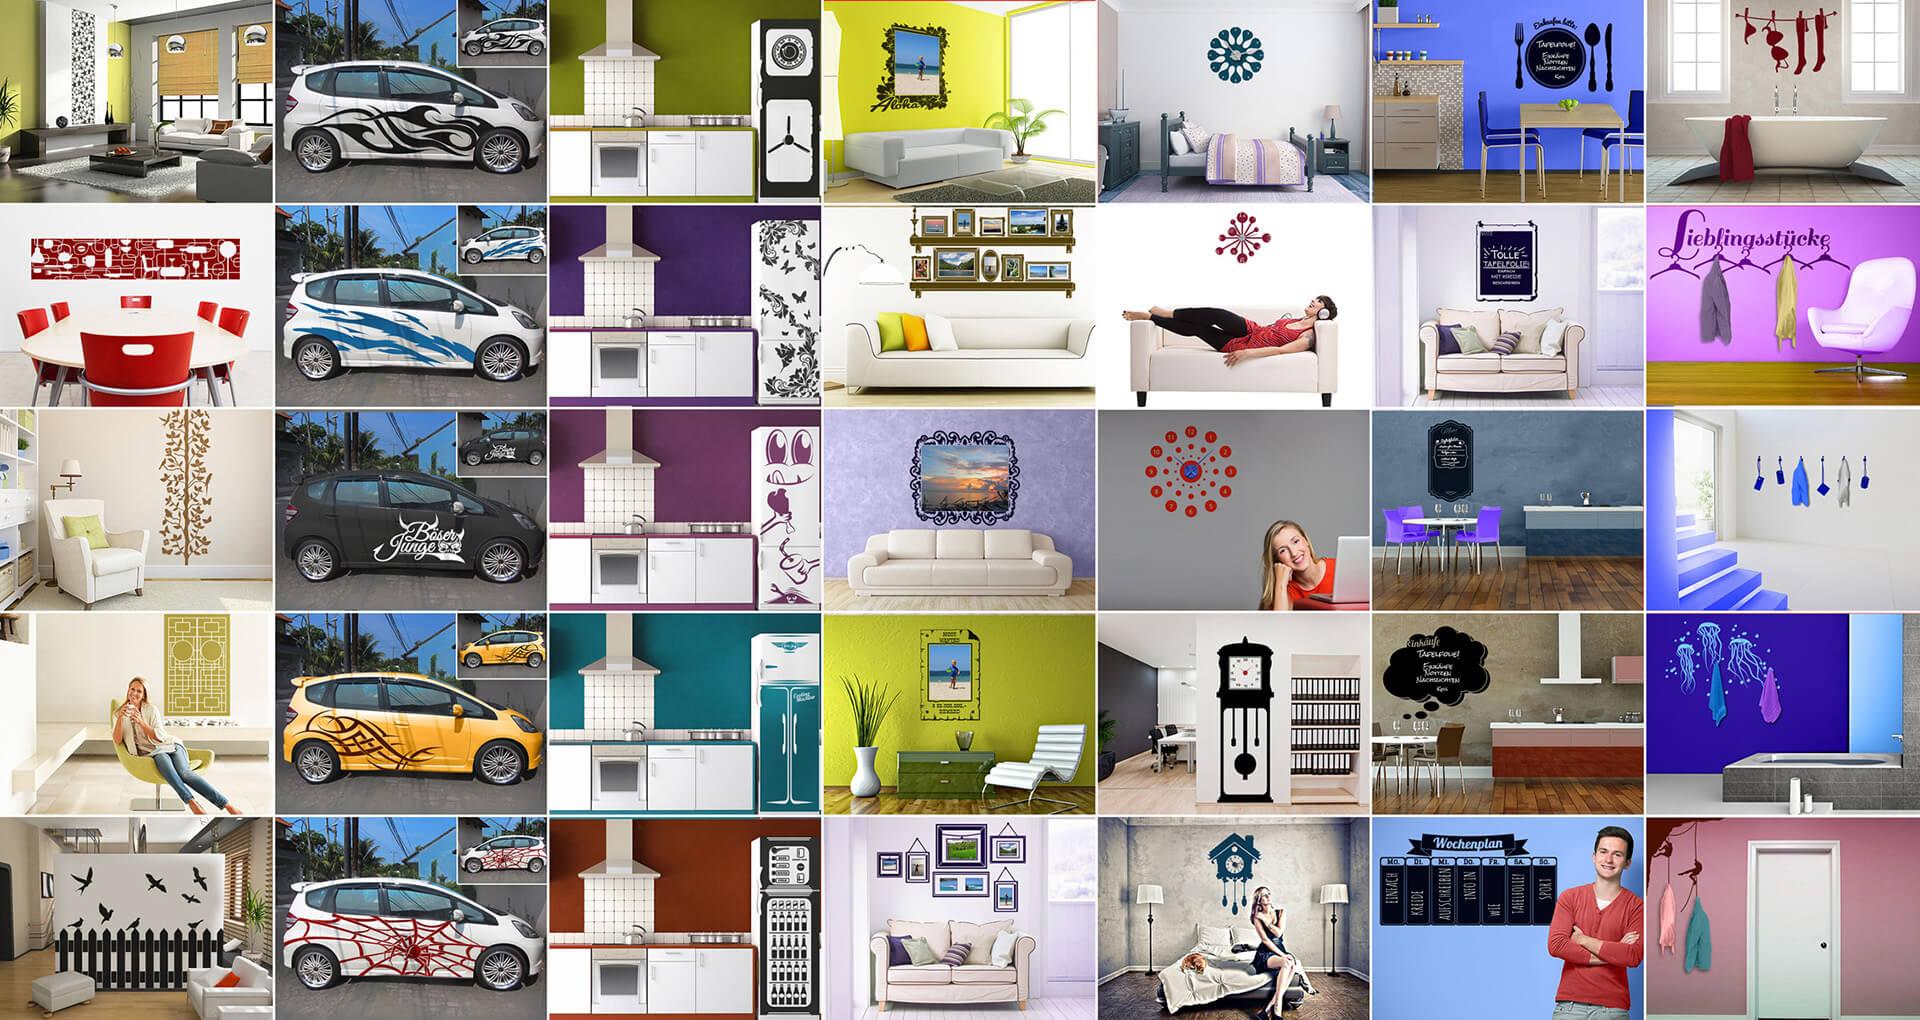 webtoprint fotobuch variable grafik walltattoo popart calendar smartphone case greeting card 21